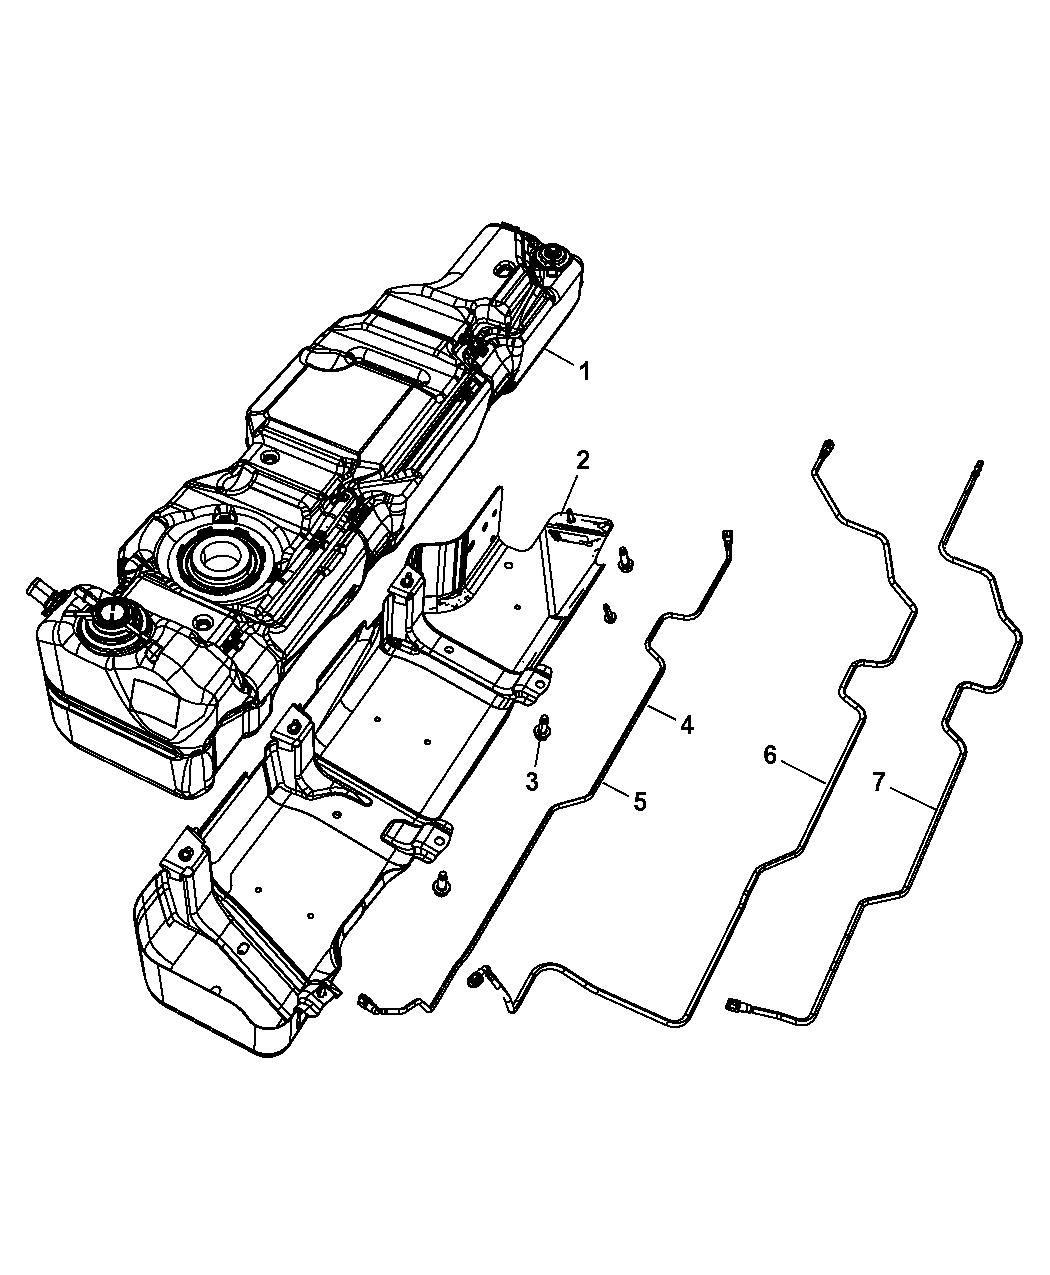 2011 jeep wrangler fuel tank